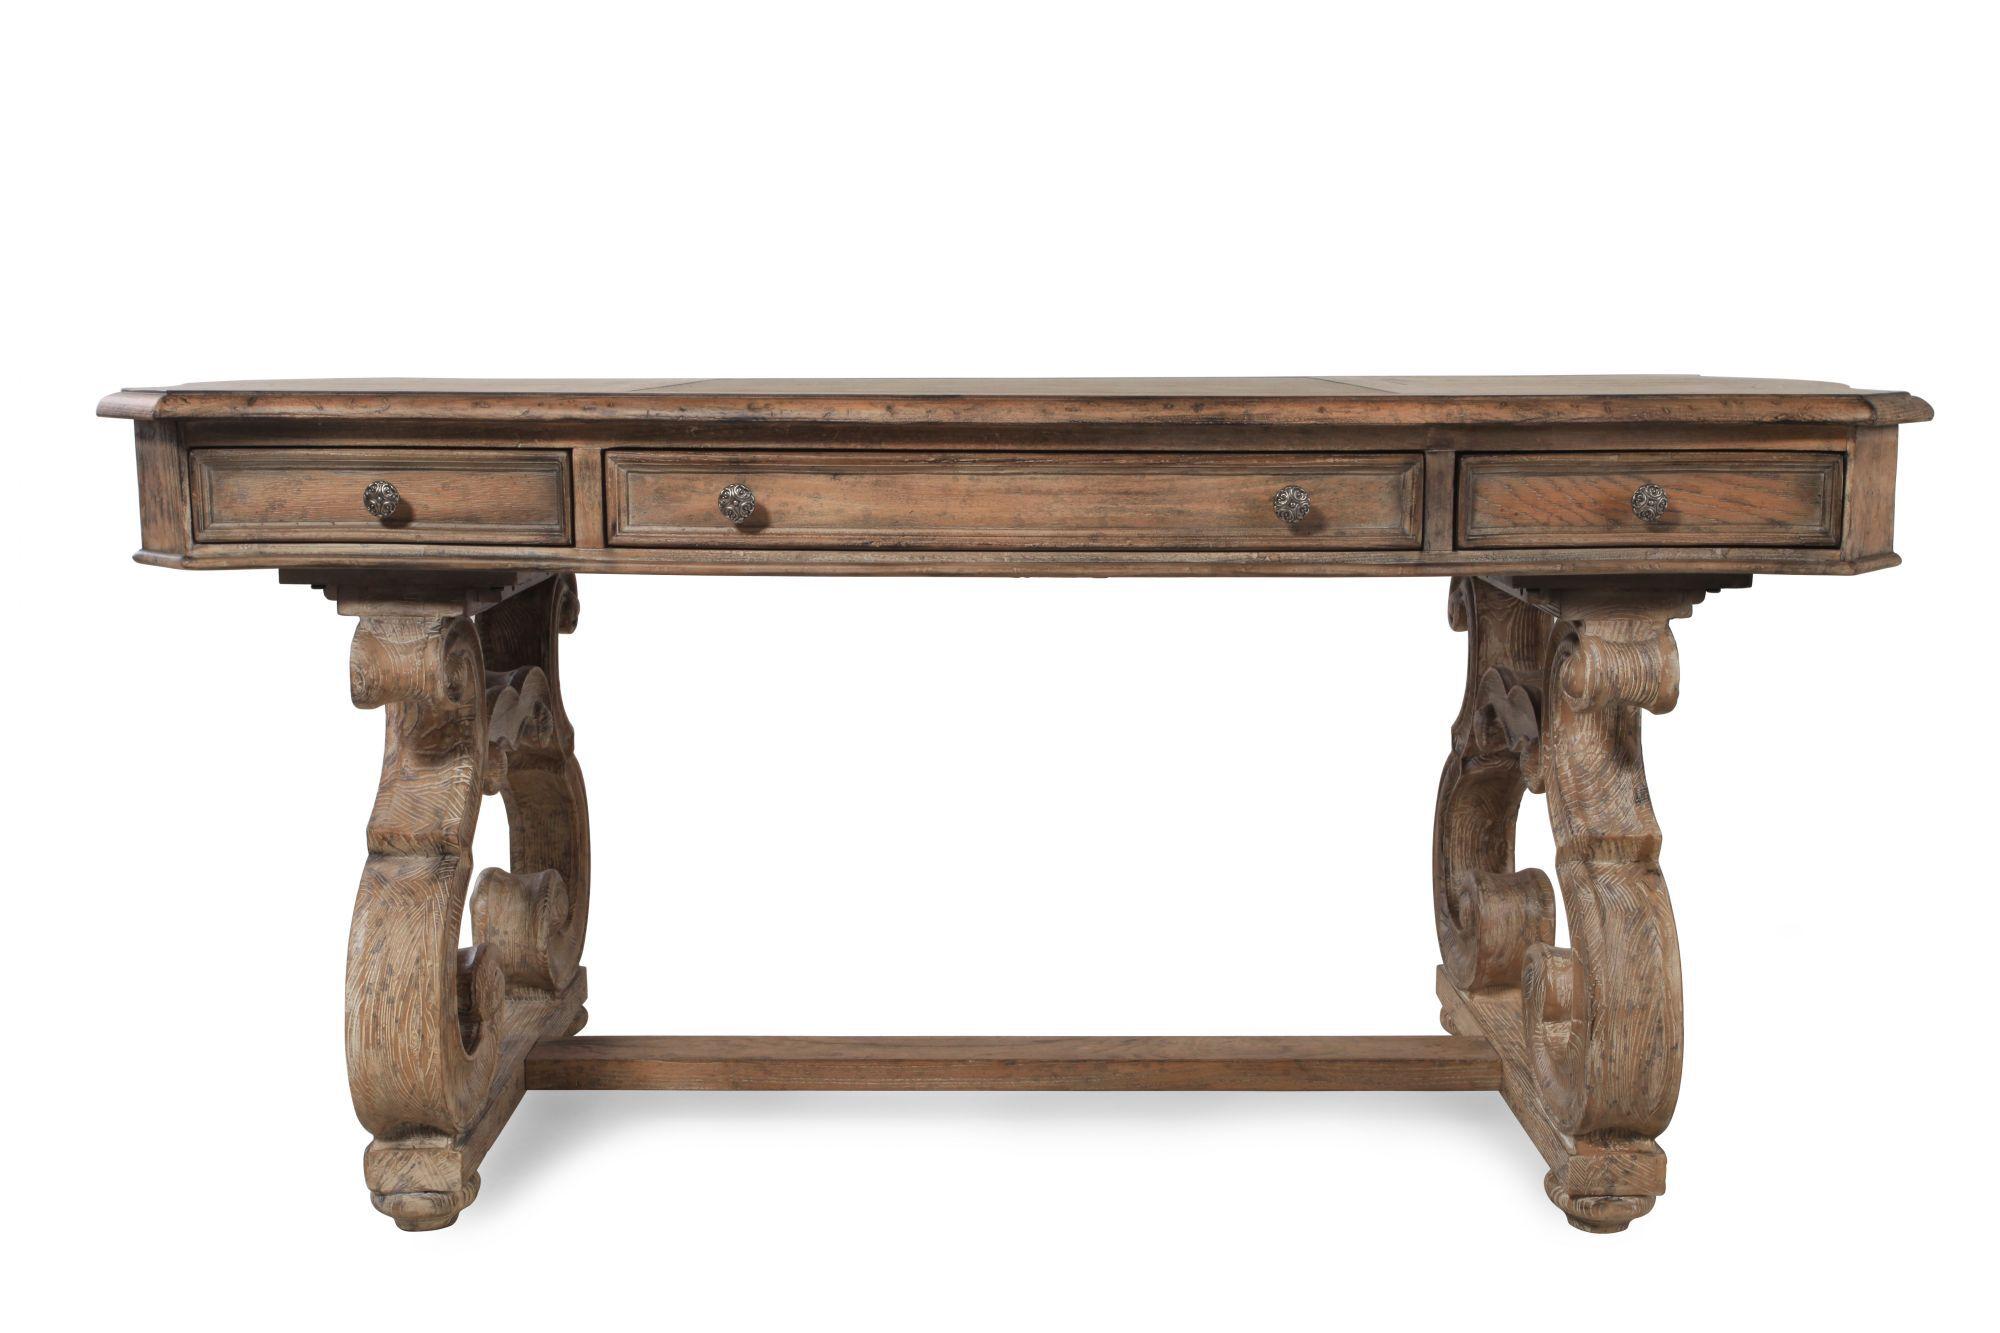 66 Traditional ScrolledLeg Writing Desk in Brown